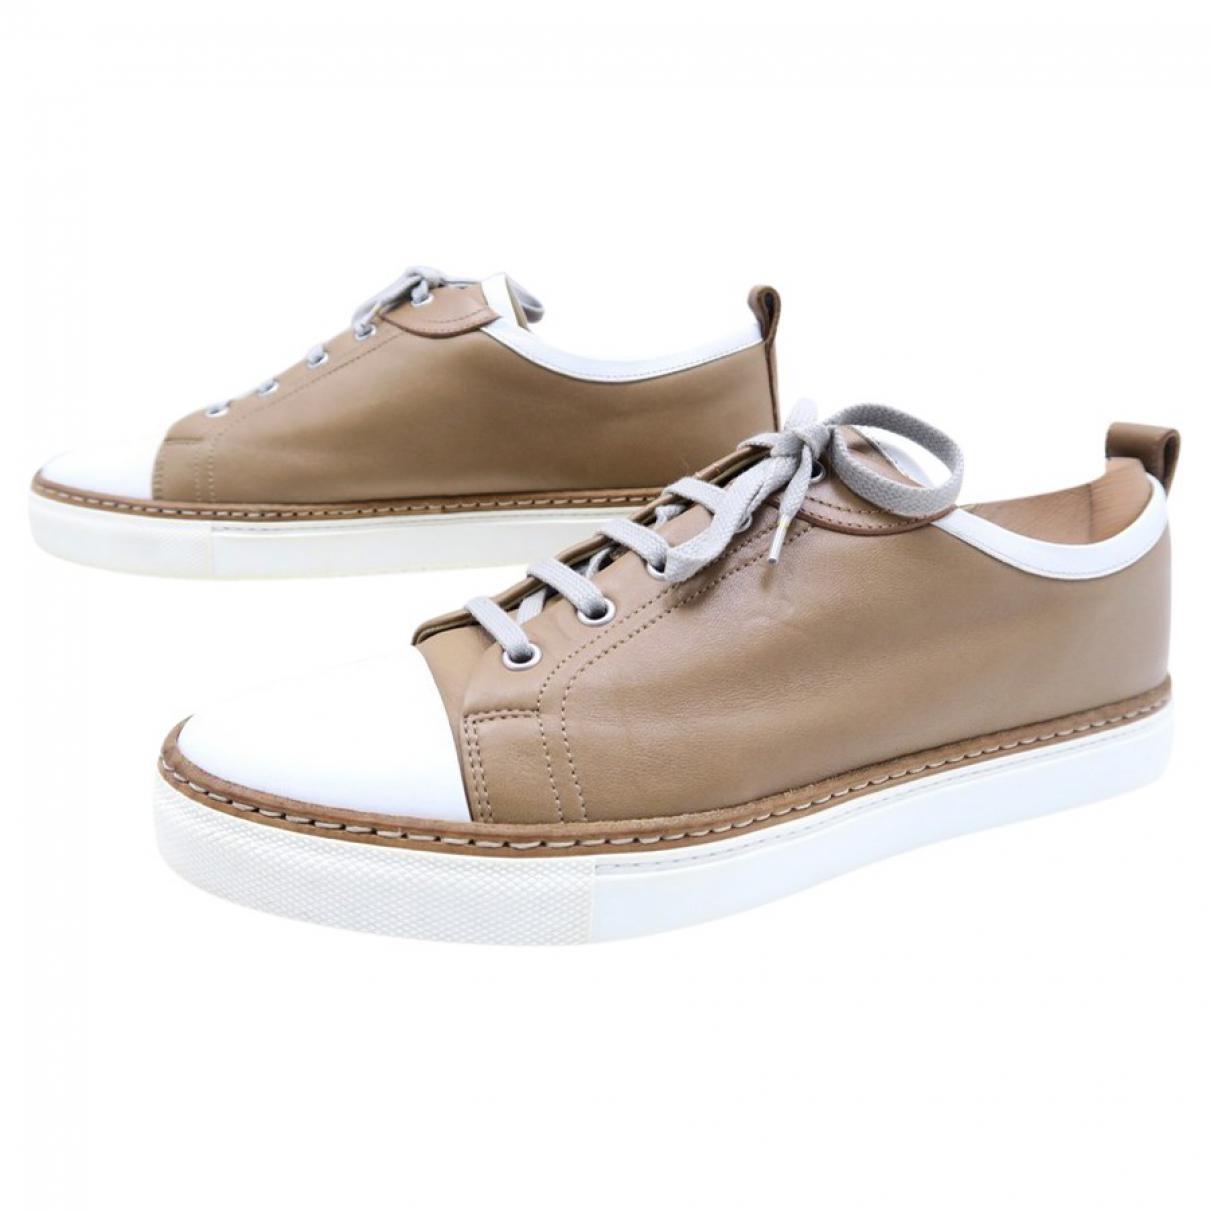 Hermès Leather Low Trainers VqL0CQ